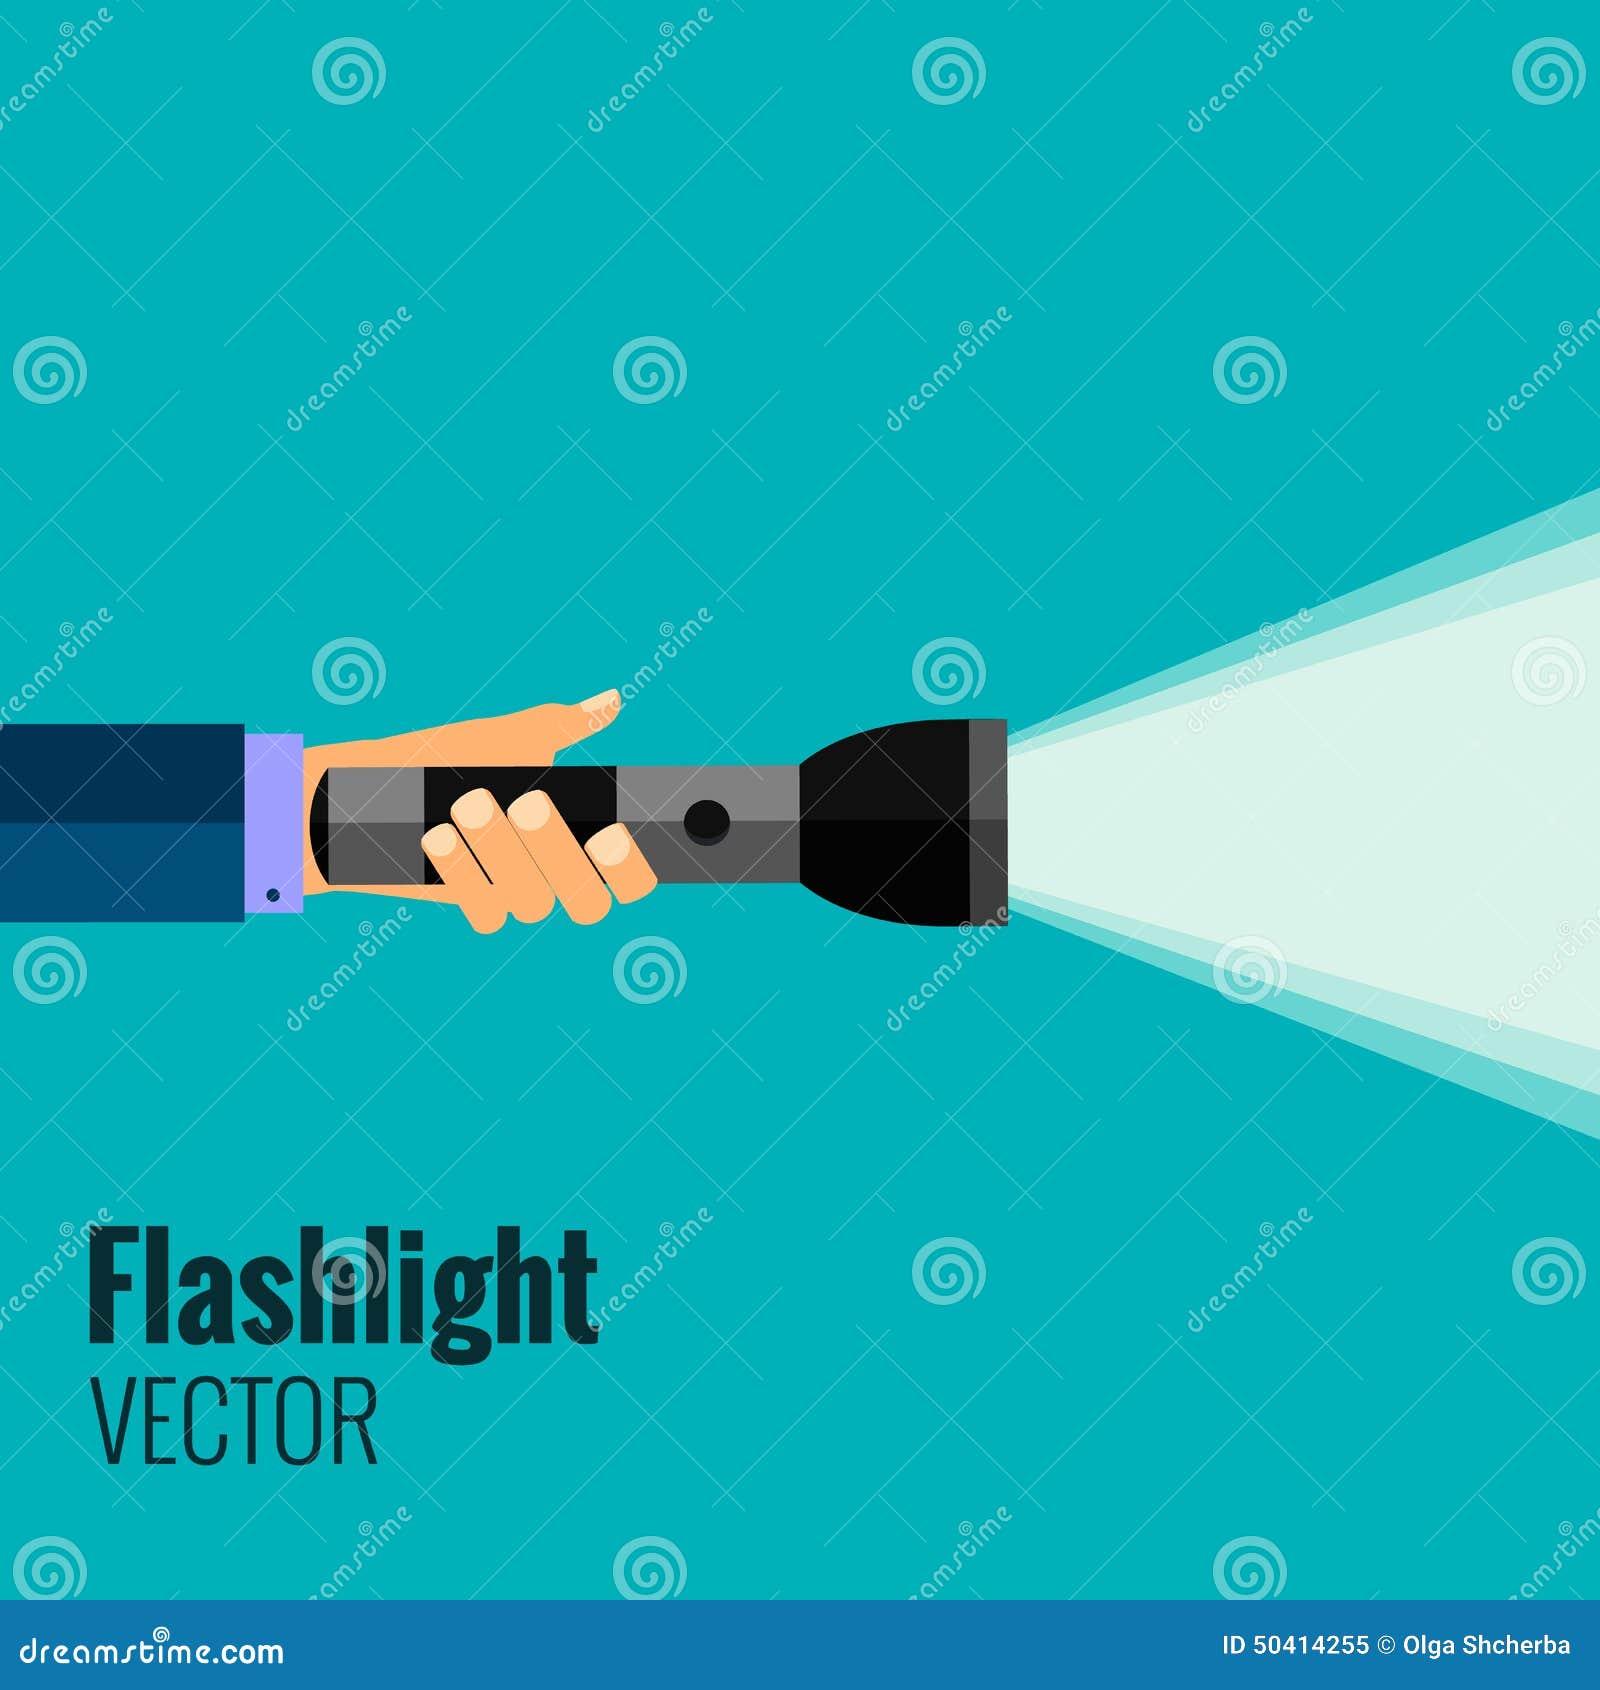 Flat flashlight stock vector. Illustration of optimization - 50414255 for Flash Light Vector Background  34eri